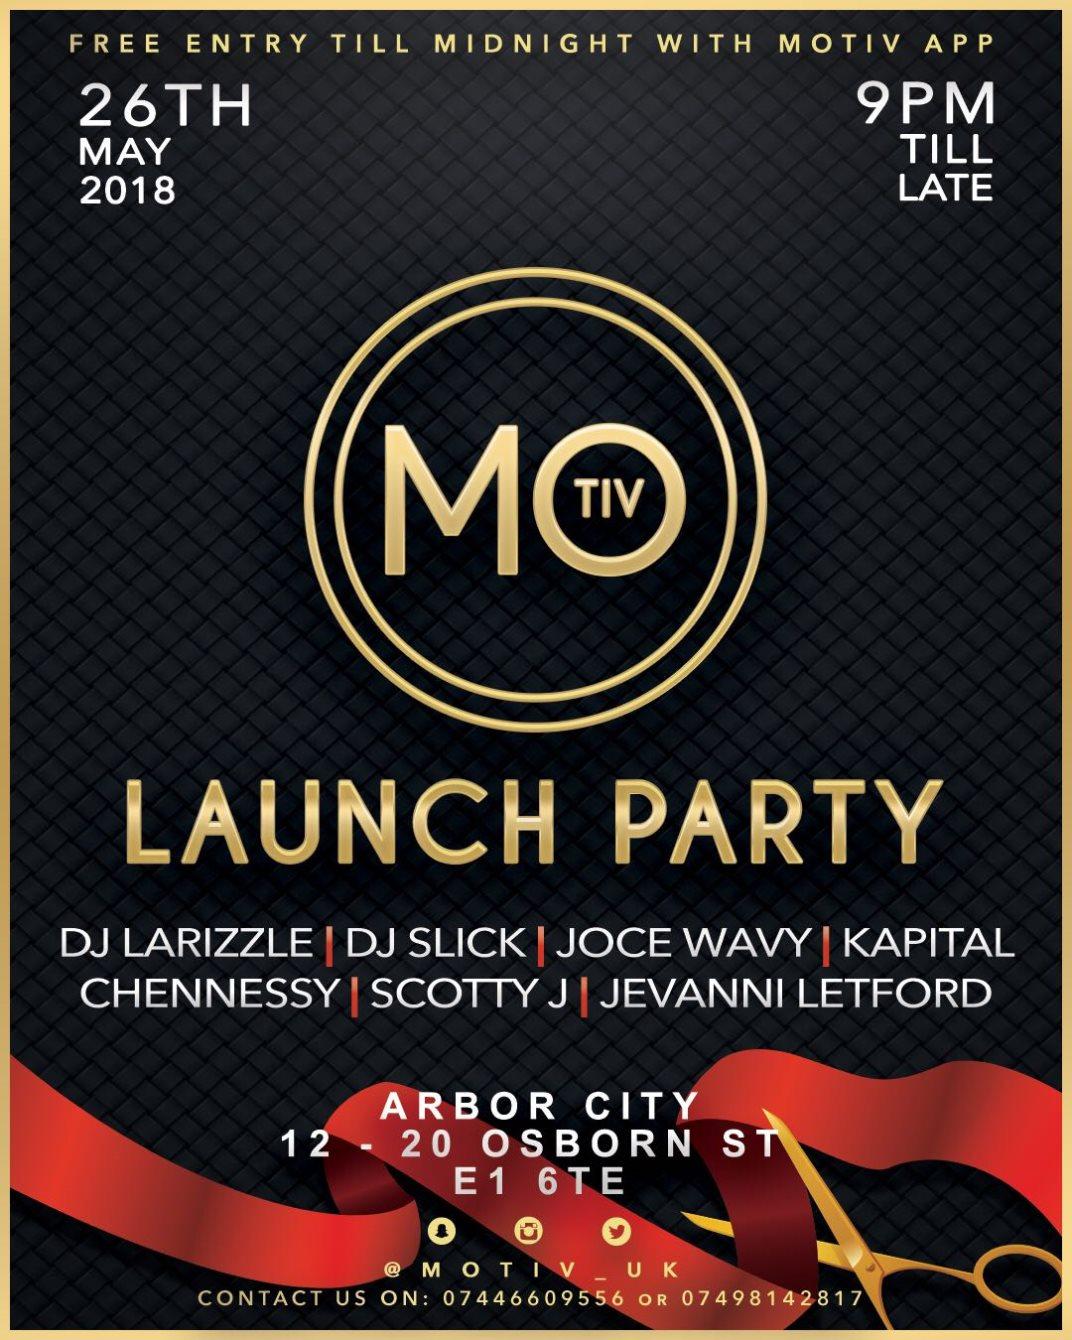 ra motiv uk app launch party at arbor city london